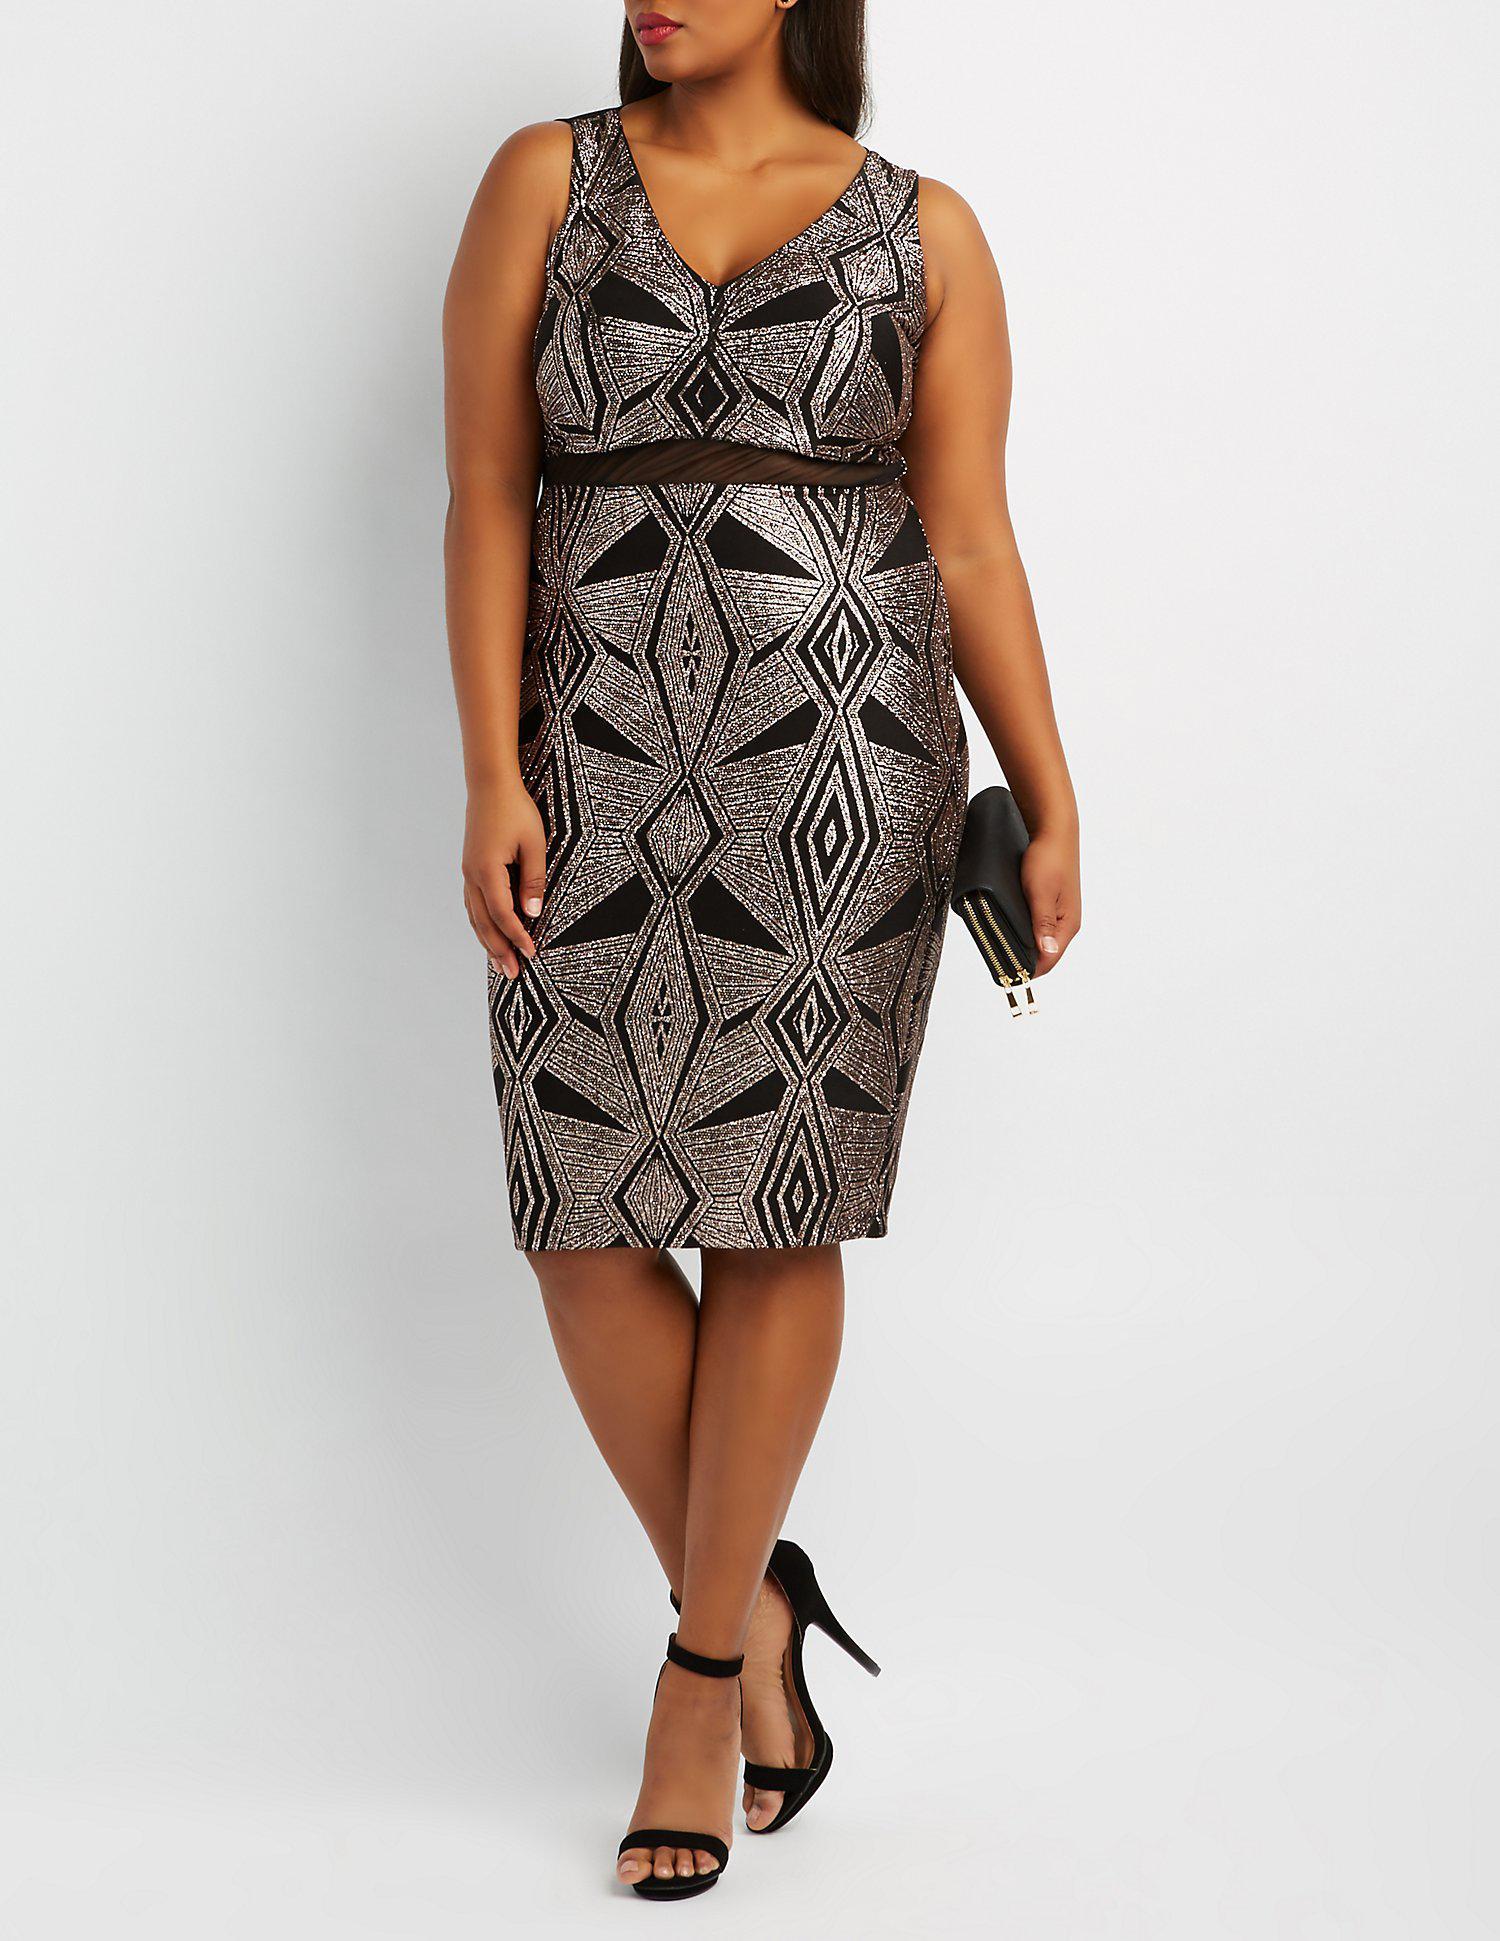 b6595b58d9a5 Lyst - Charlotte Russe Plus Size Glitter & Mesh Bodycon Dress in Black